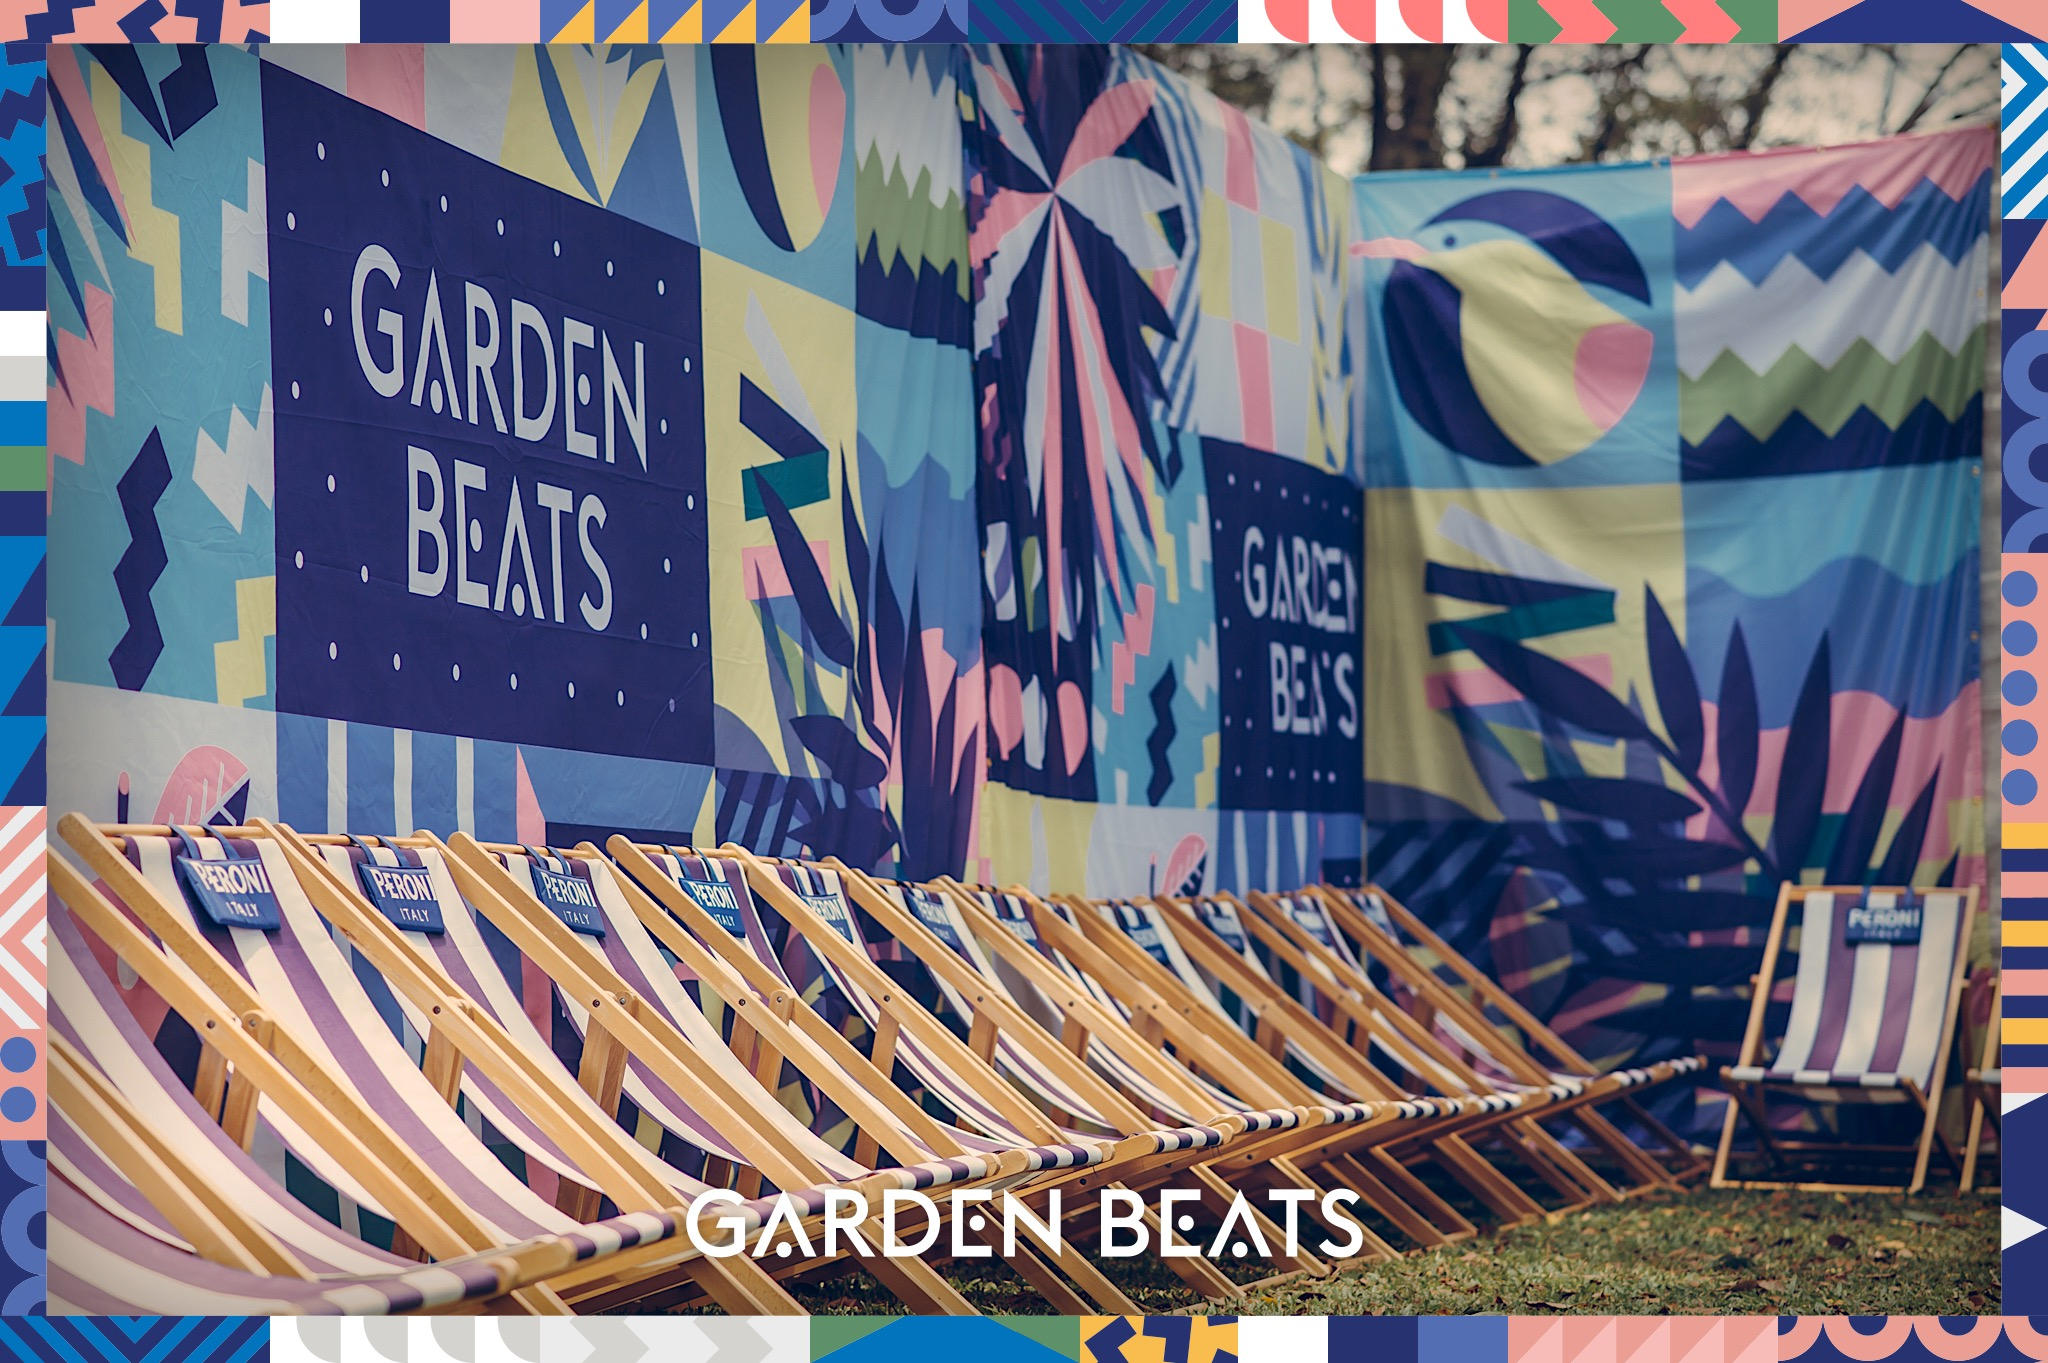 03032018_GardenBeats_Colossal028_Watermarked.jpg